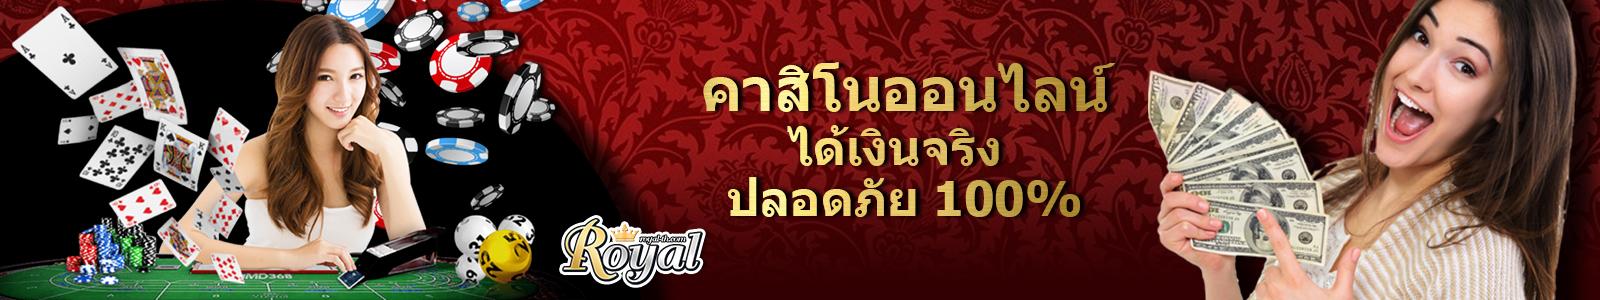 Royal-th banner casino safe